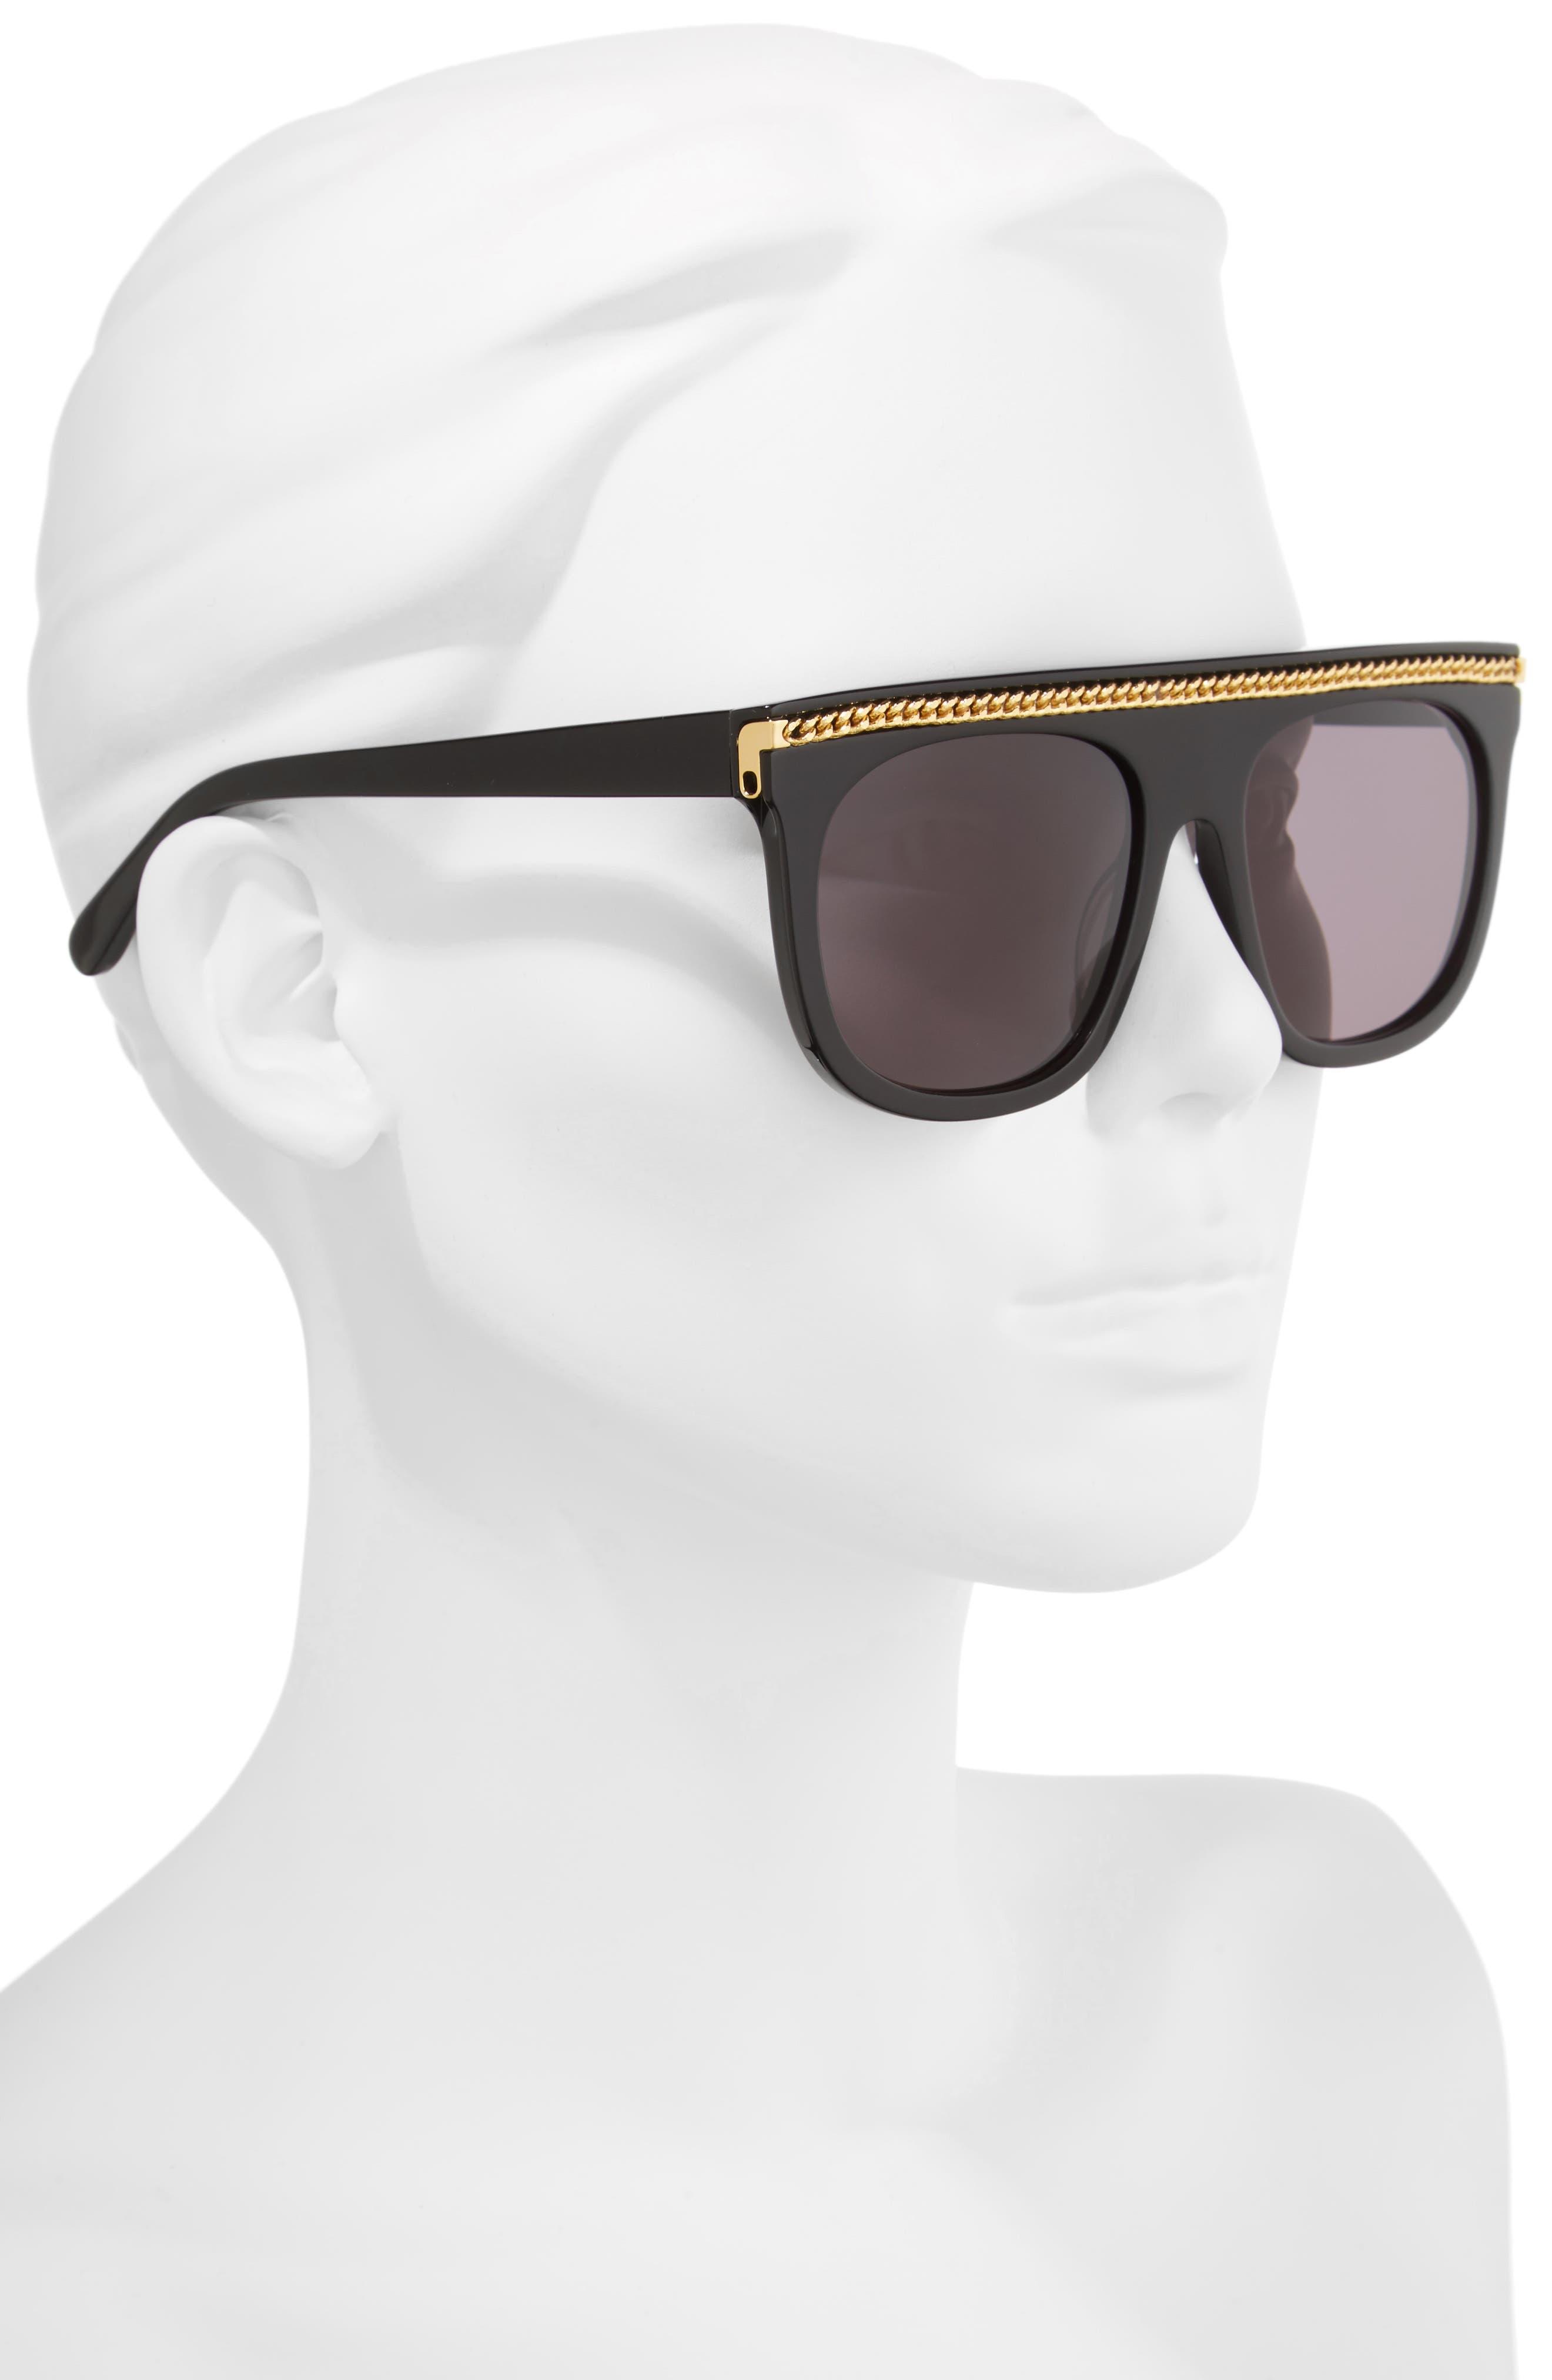 55mm Flat Top Sunglasses,                             Alternate thumbnail 2, color,                             001